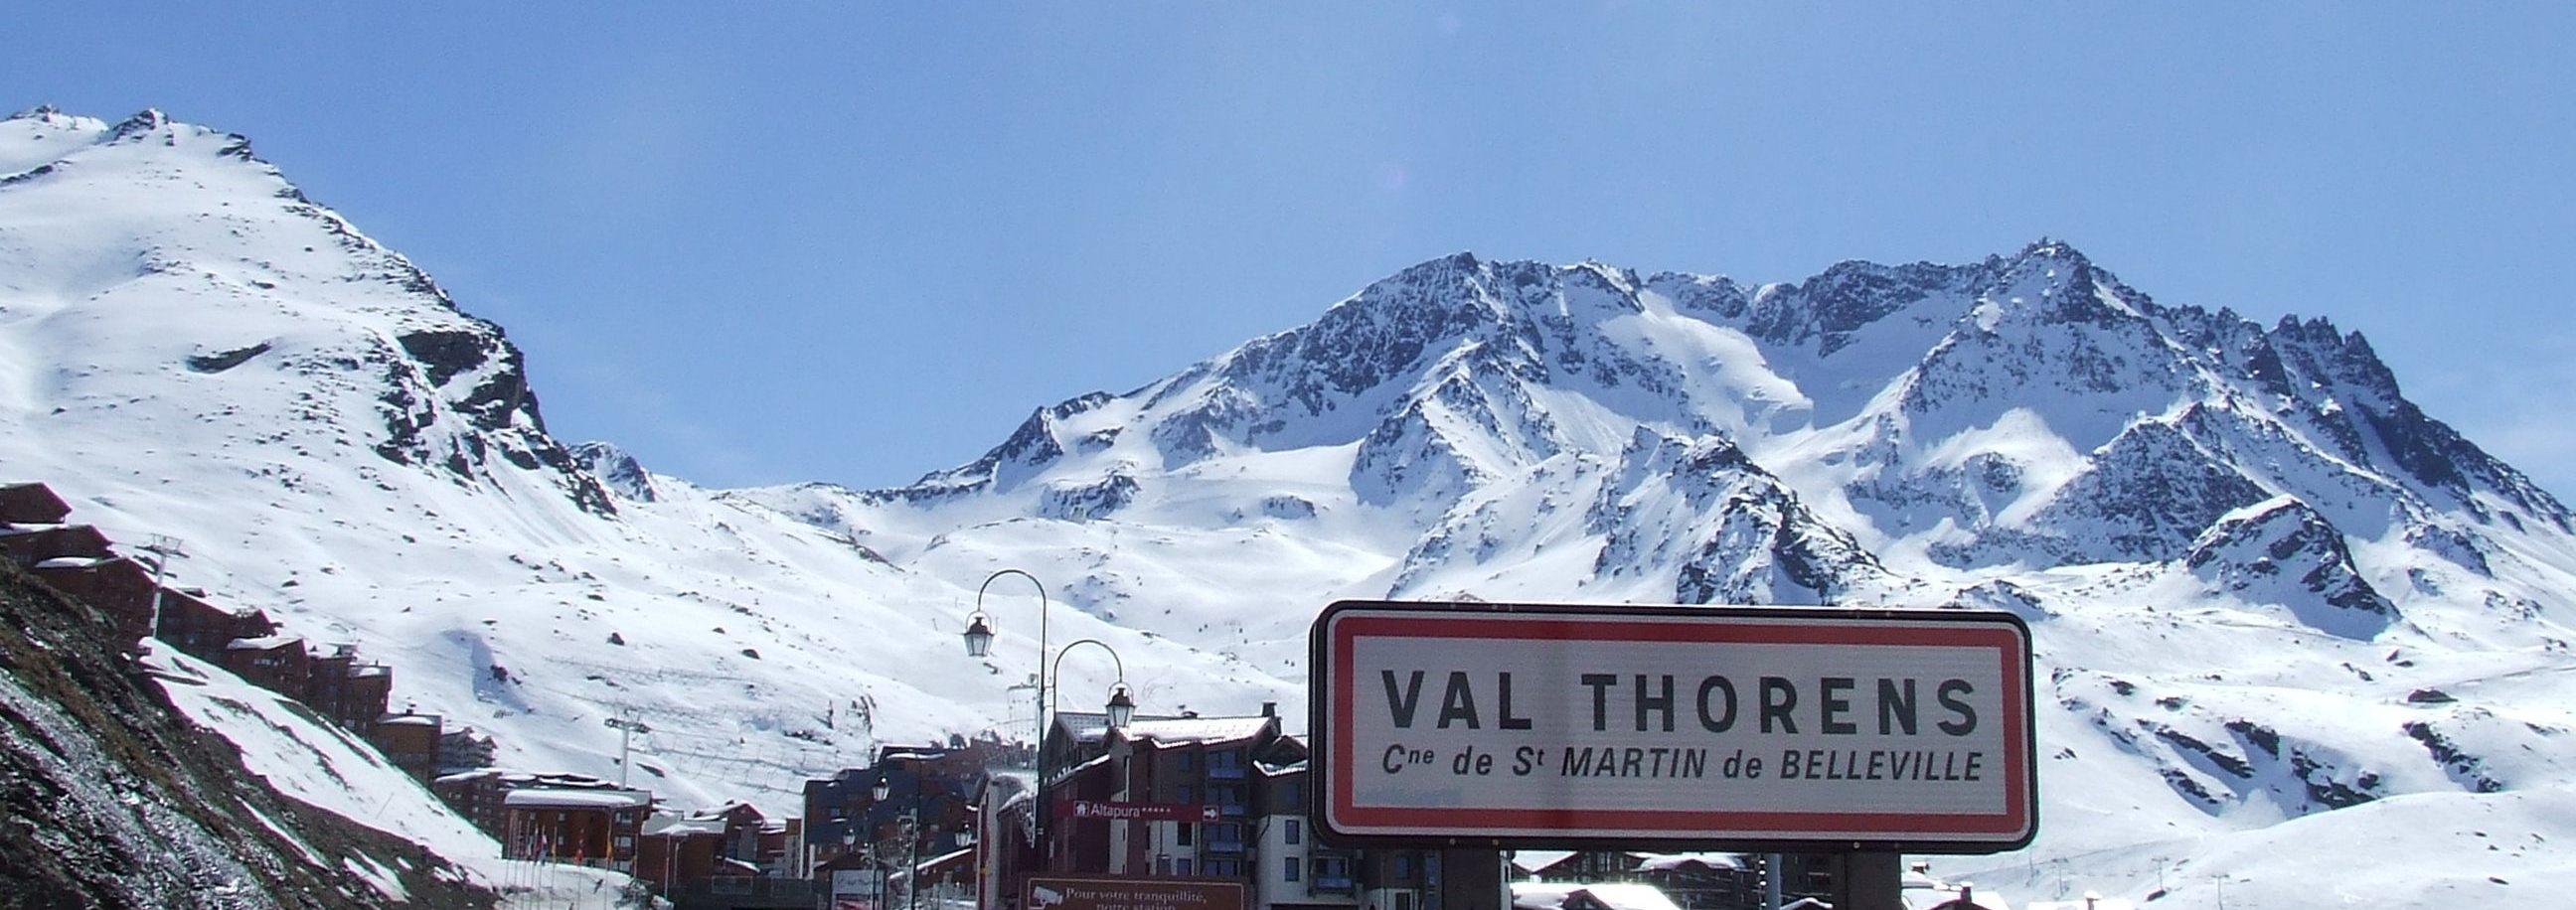 Val Thorens Alpy Francja